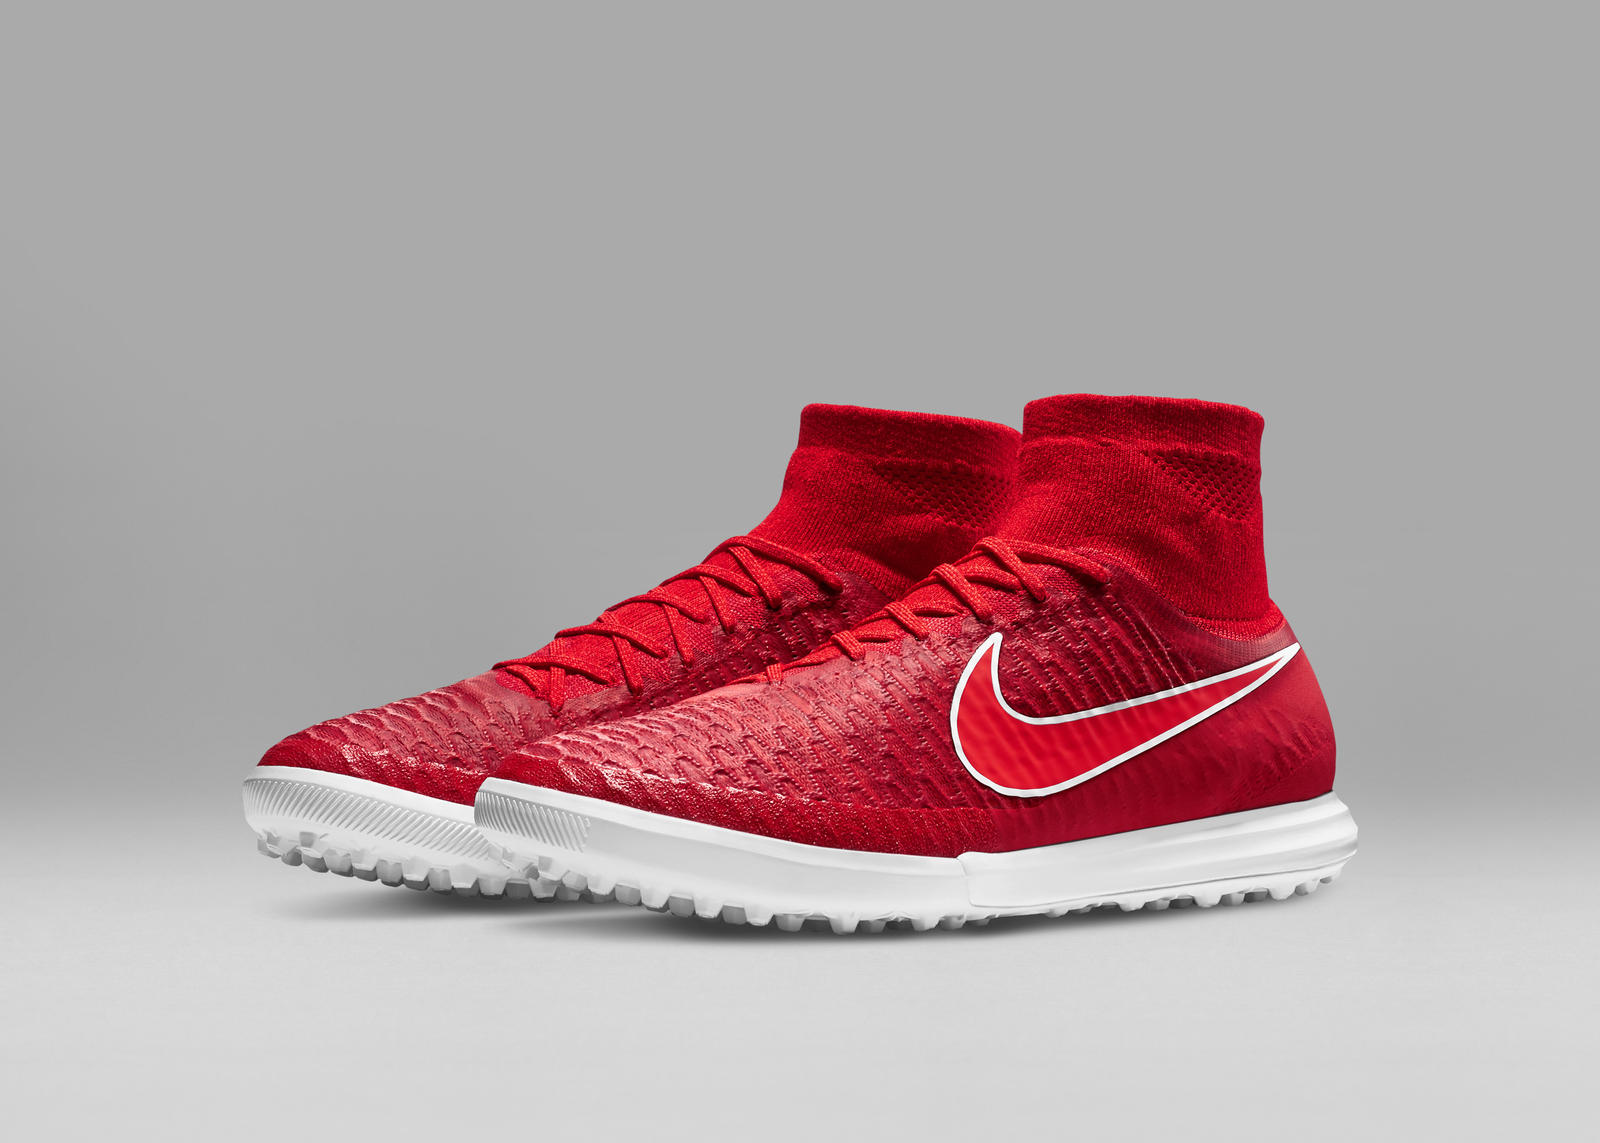 Nike-Football-Soccer_NFX_STREET_MAGISTAX_PROXIMO_TF_E_PREM